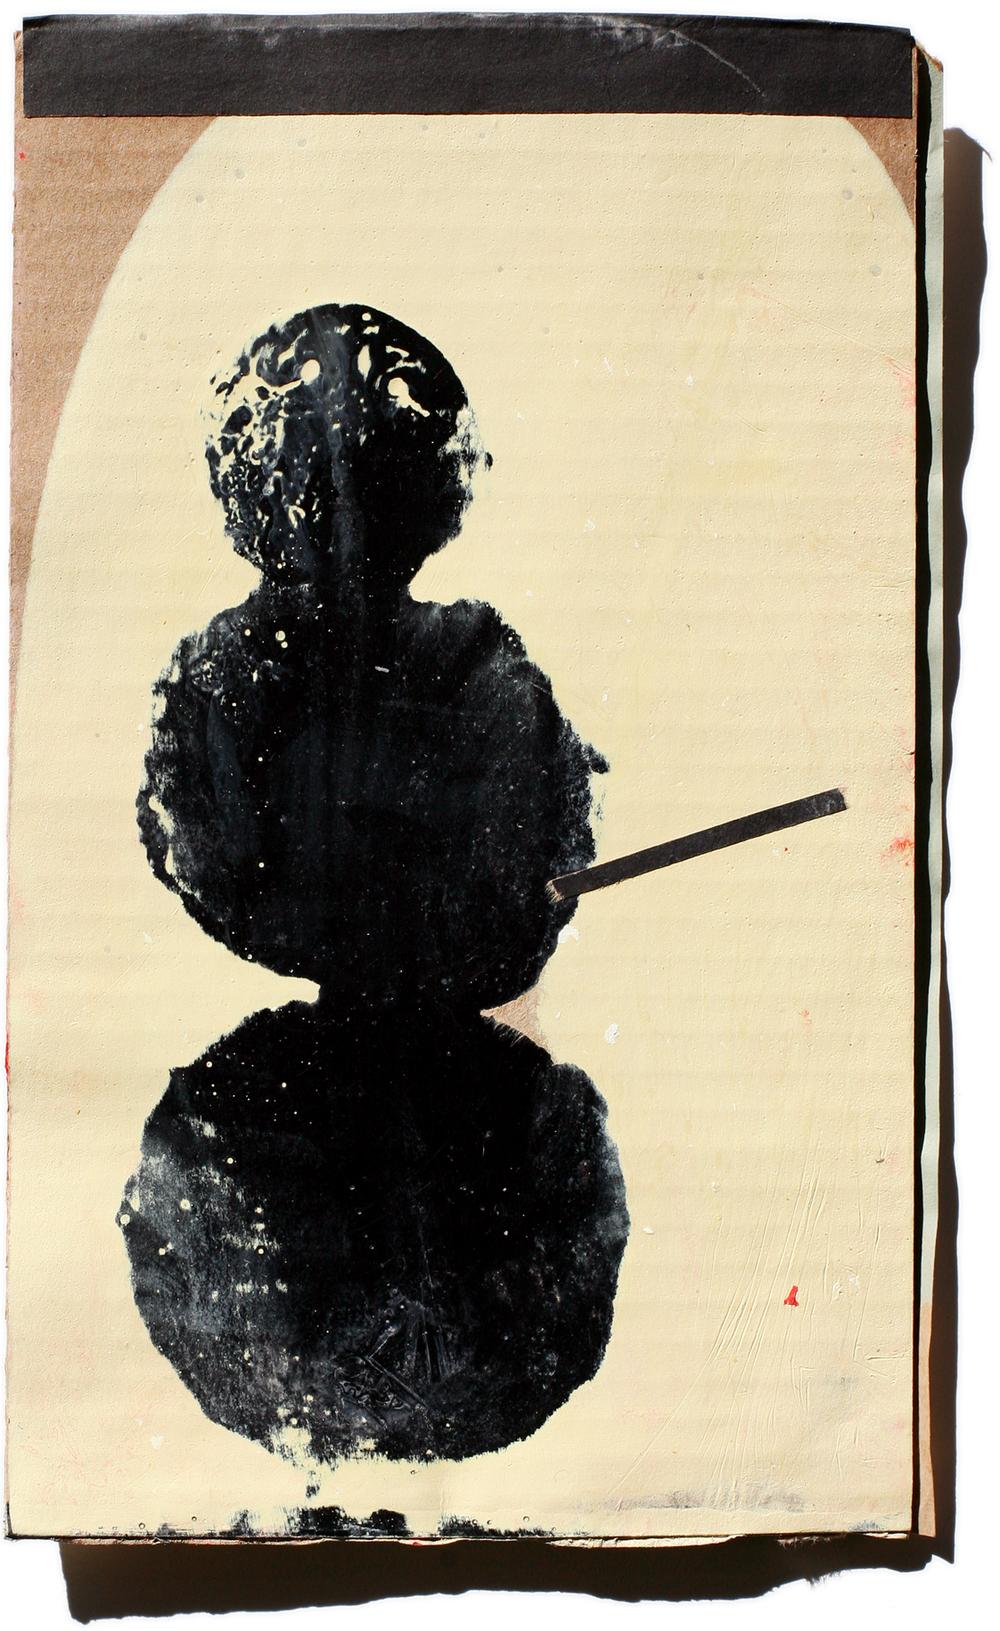 Snowman 04, mixed media on cardboard